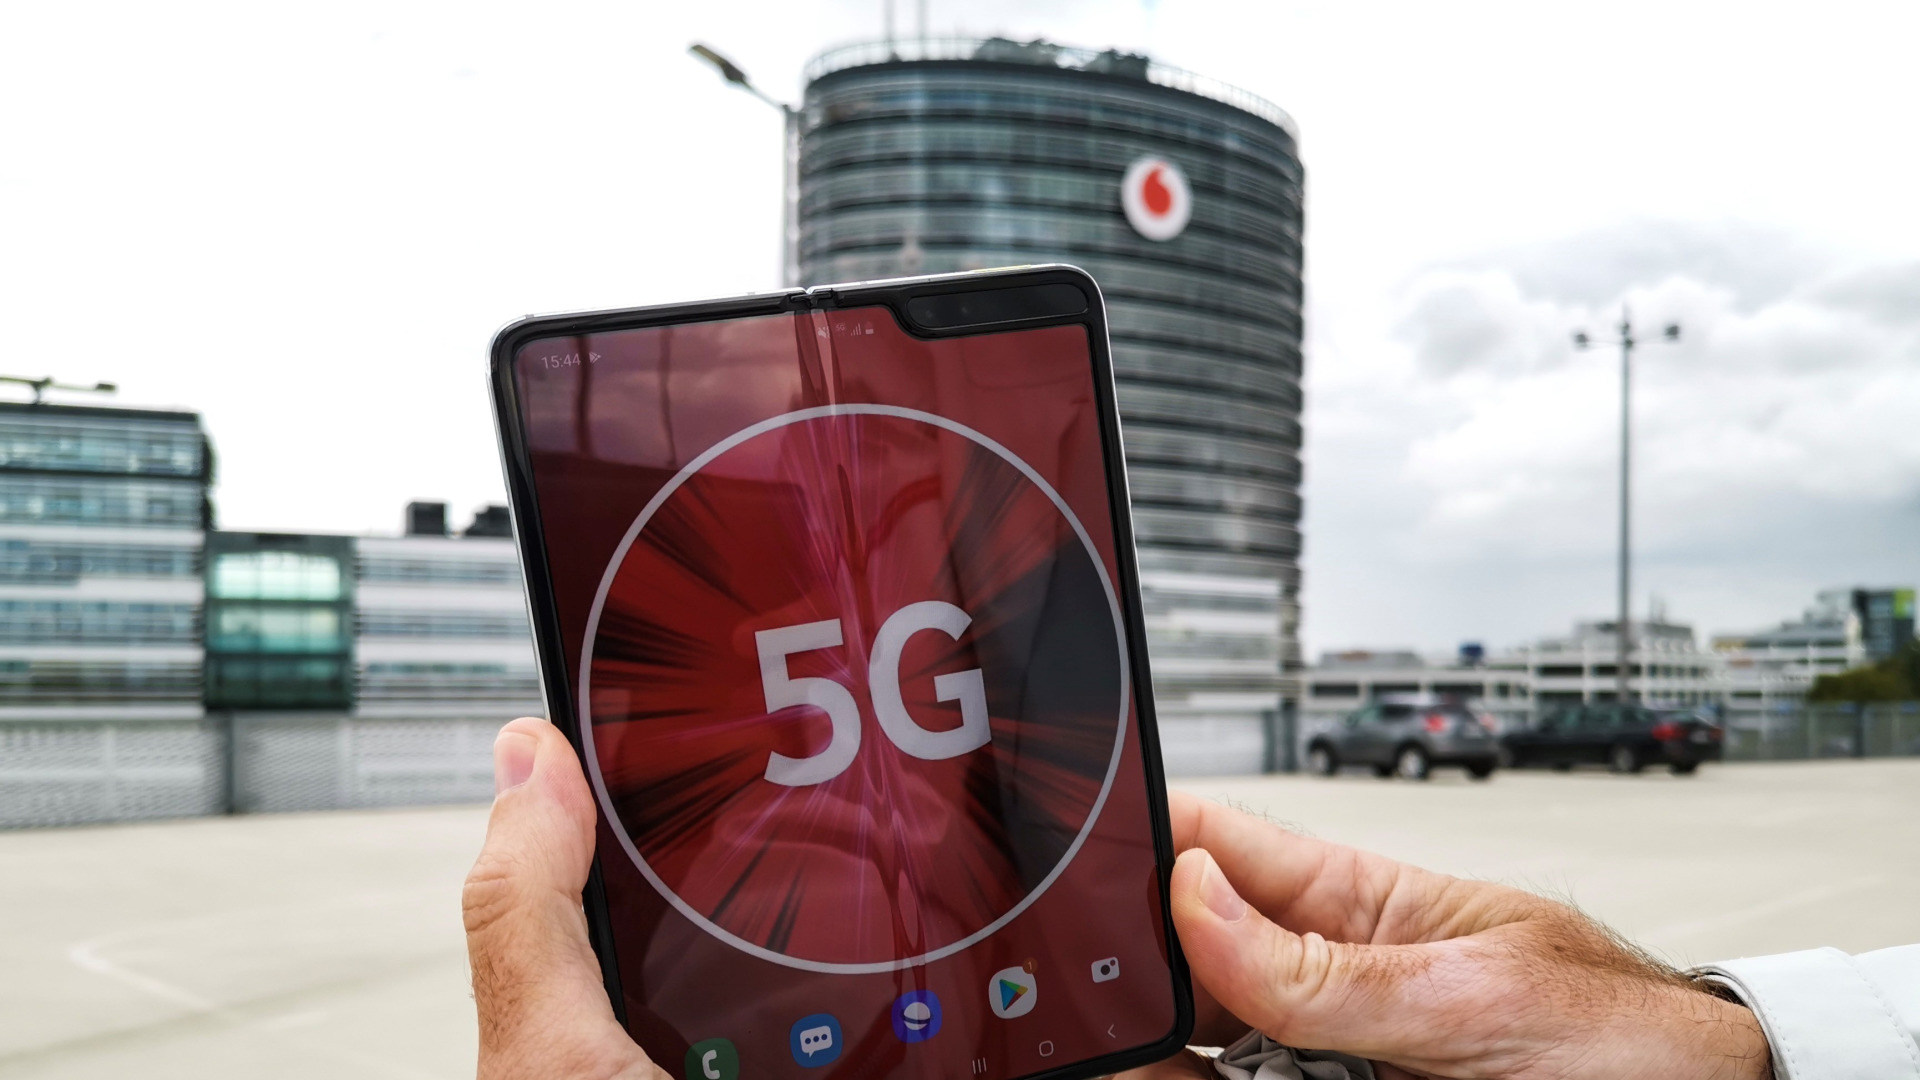 Smartphone, Mobilfunk, 5G, Vodafone, Tarif, 5G-Netz